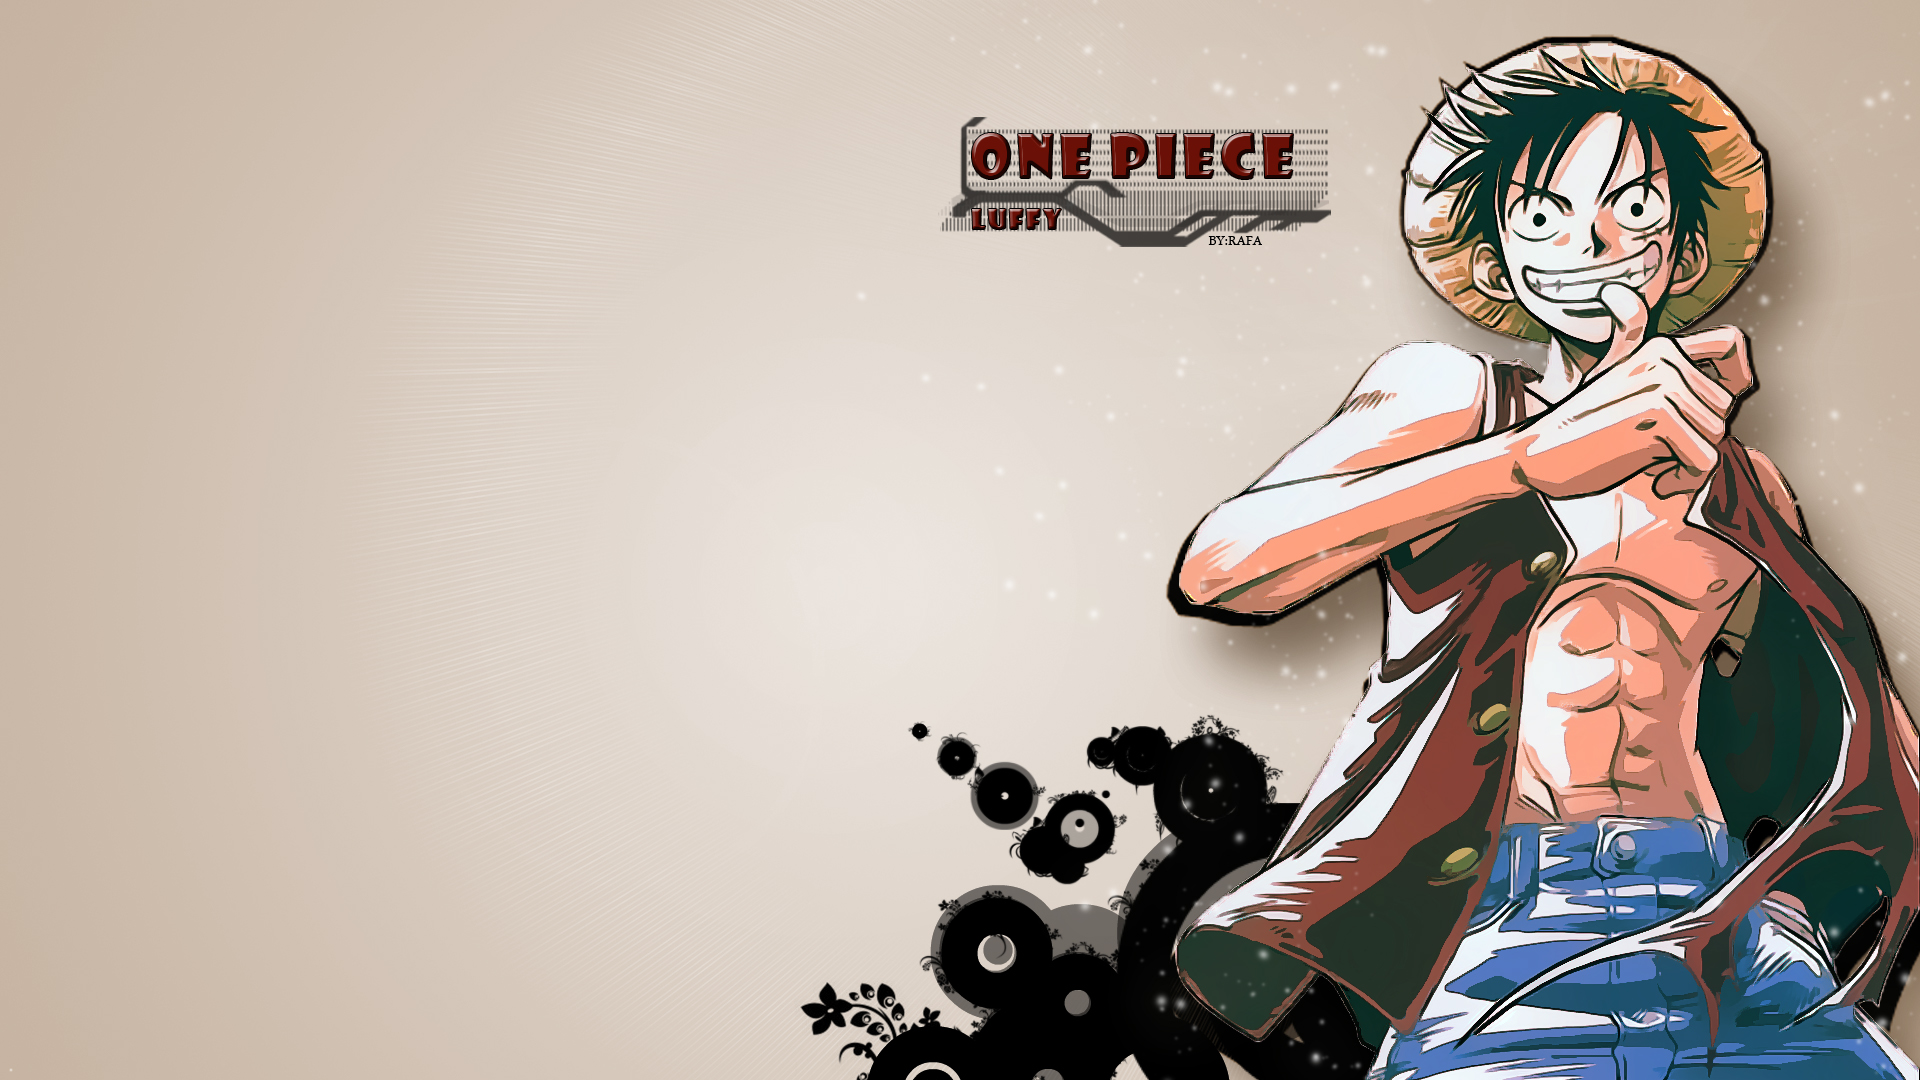 One Piece Wallpaper Af...